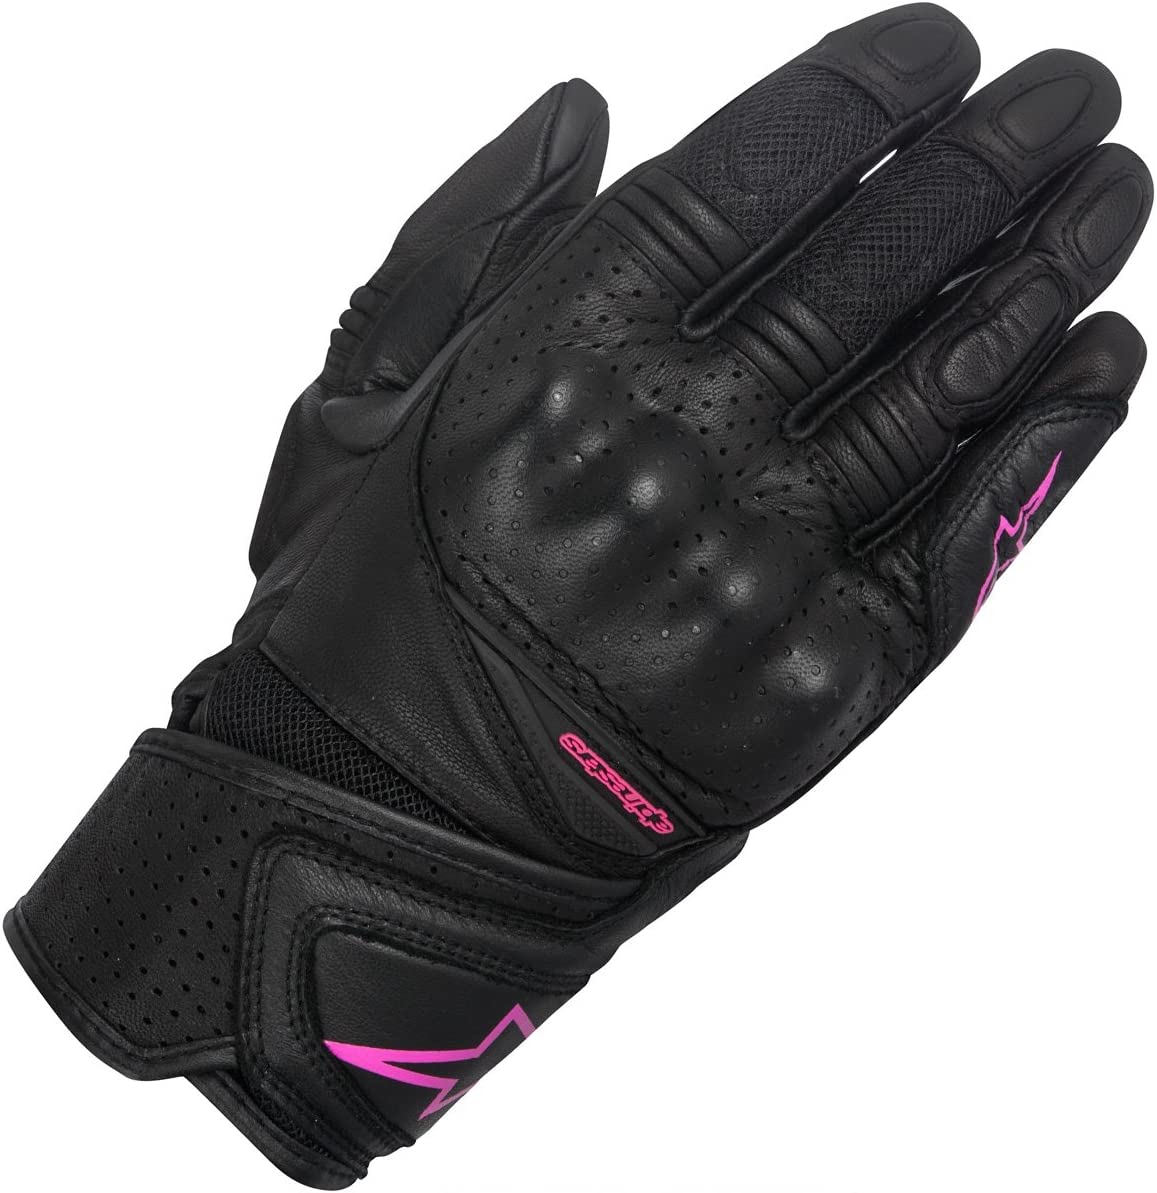 Small Alpinestars Womens Stella Baika Leather Motorcycle Riding Glove Black